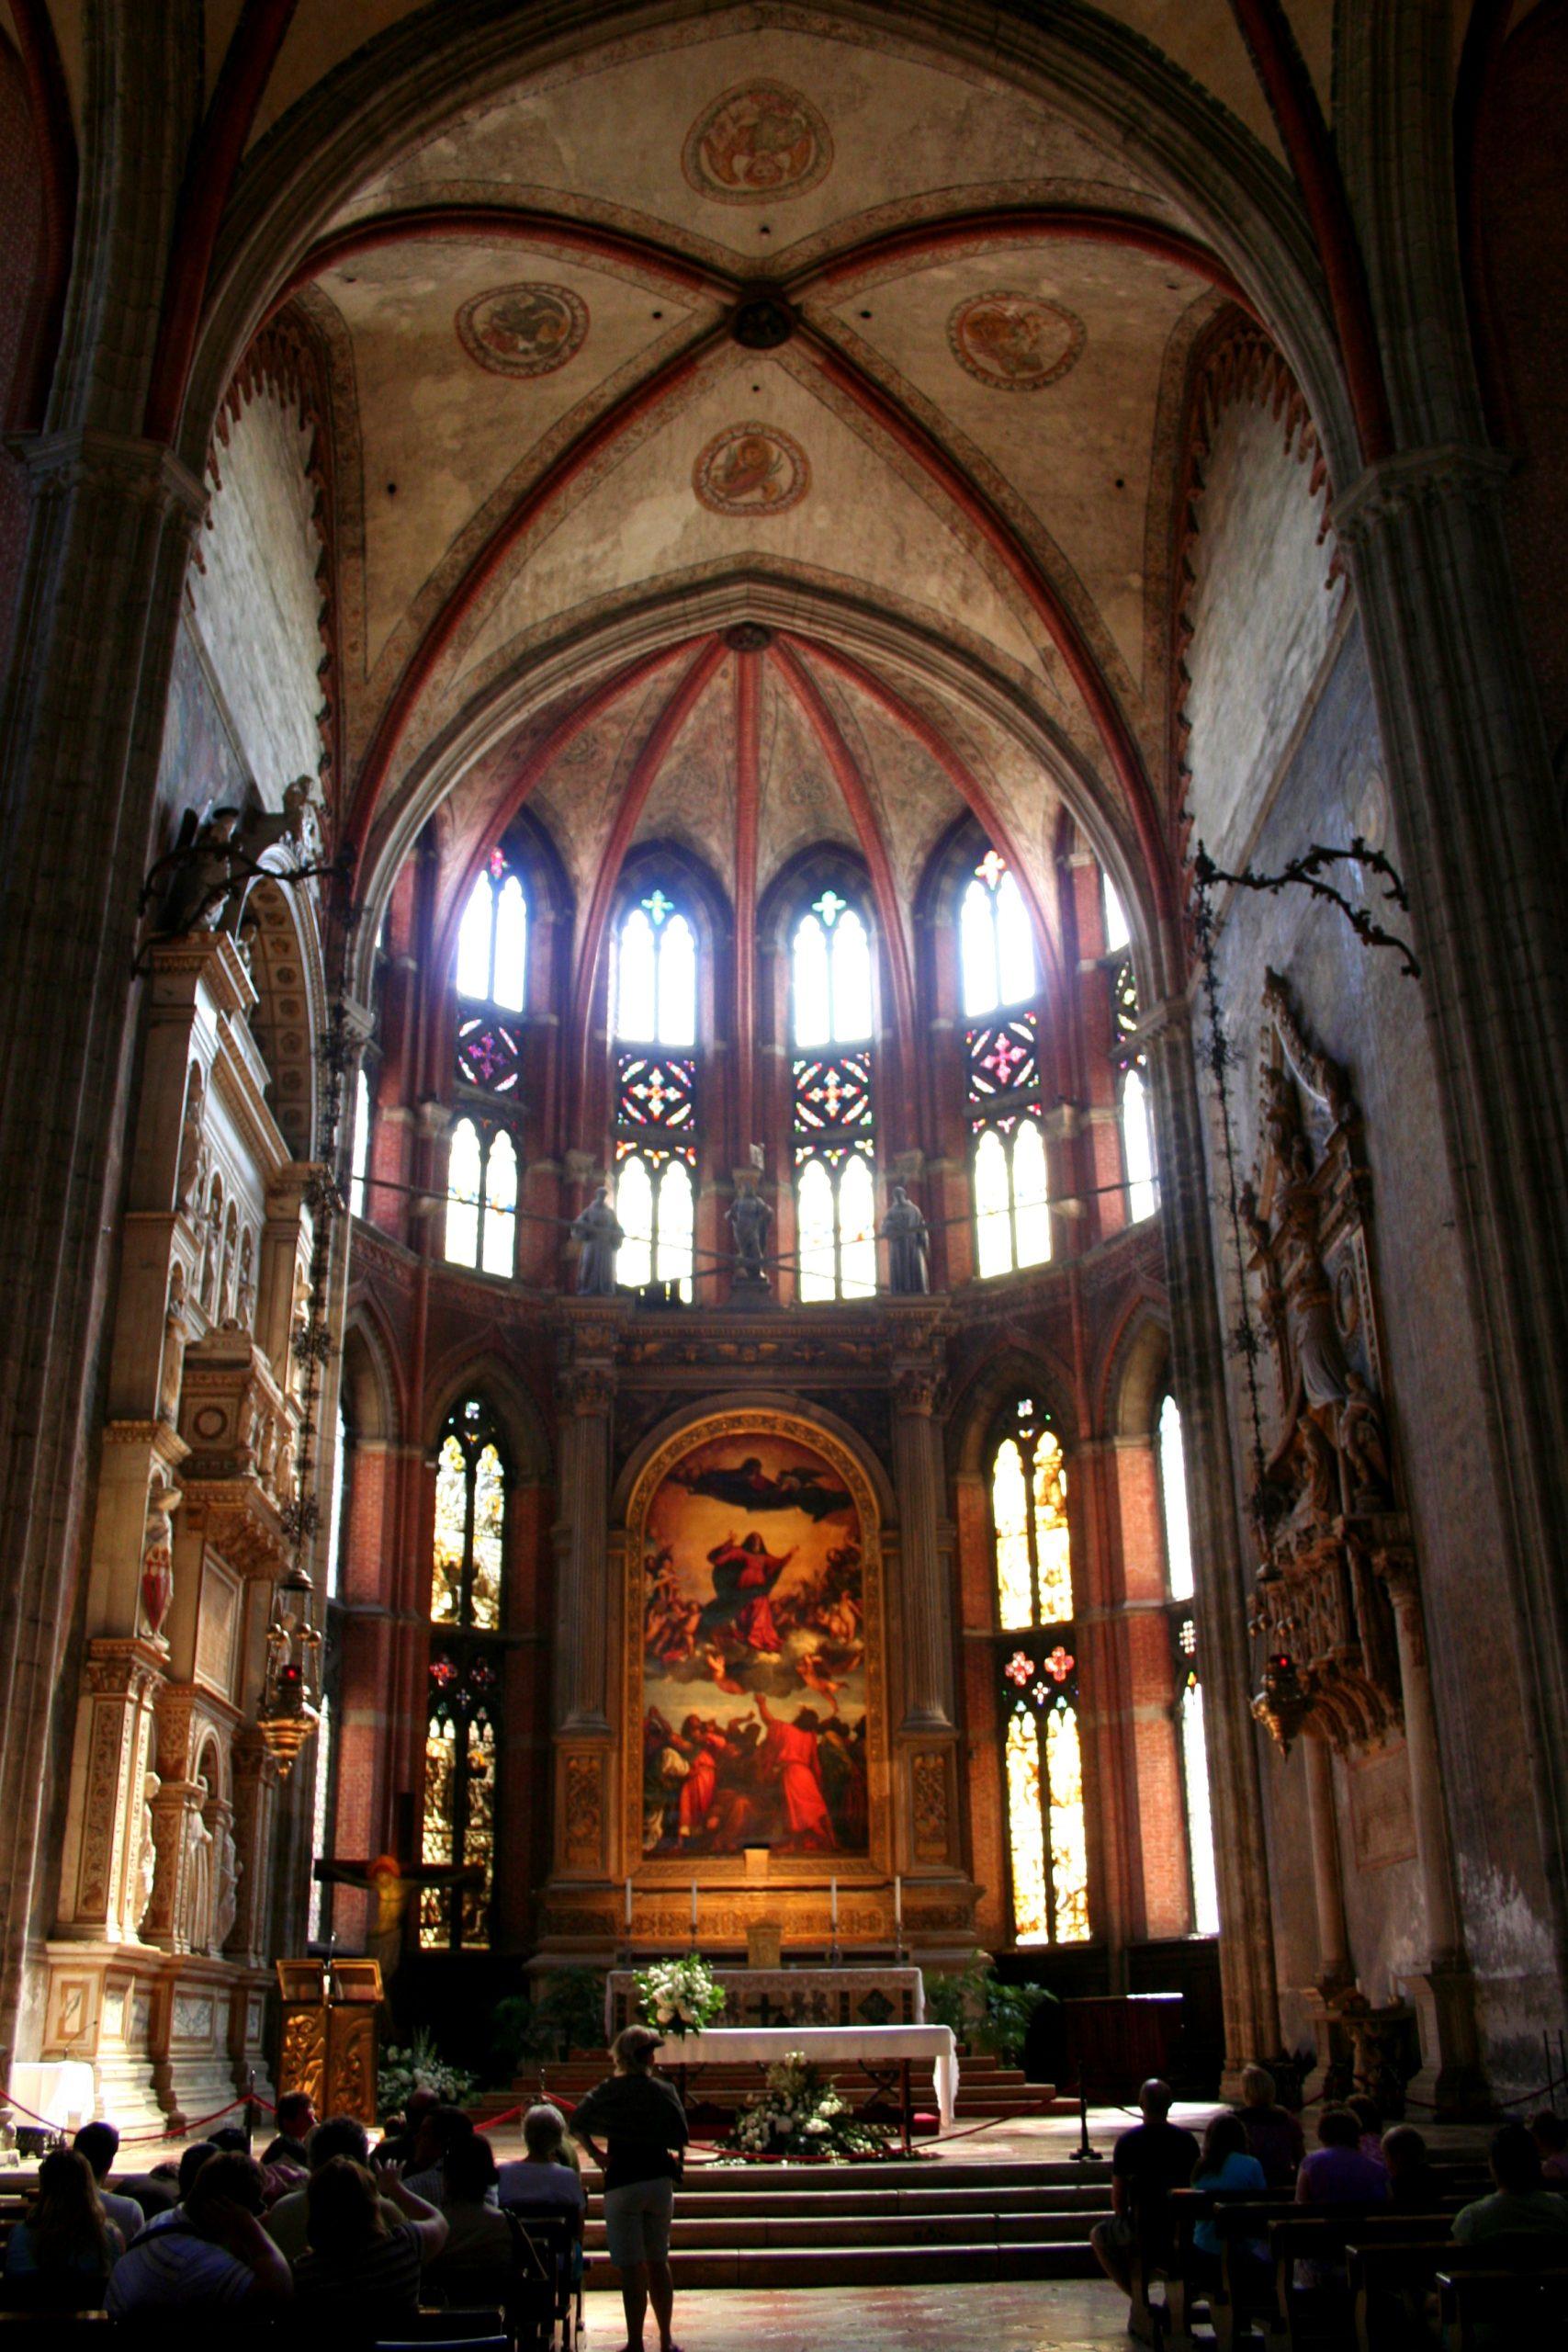 2007, Basilica di Santa Maria Gloriosa dei Frari, Venice, Italy